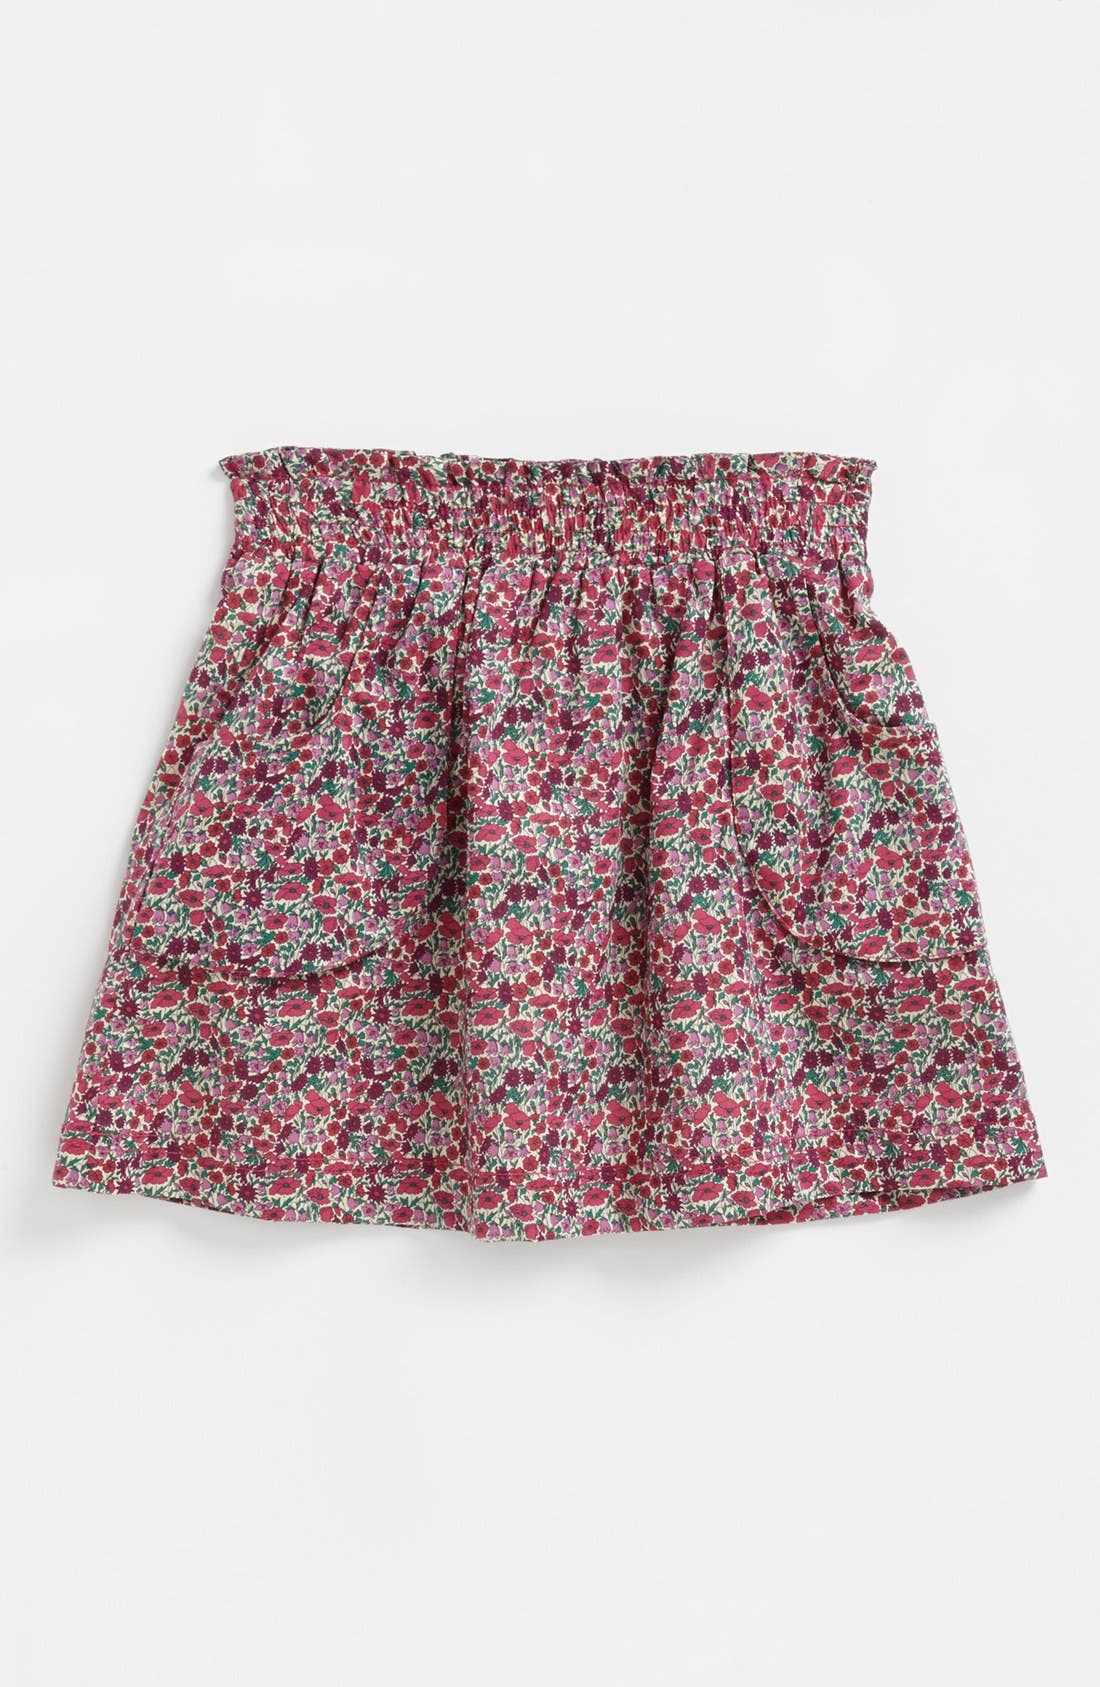 Alternate Image 1 Selected - Peek 'Sophia' Skirt (Big Girls)